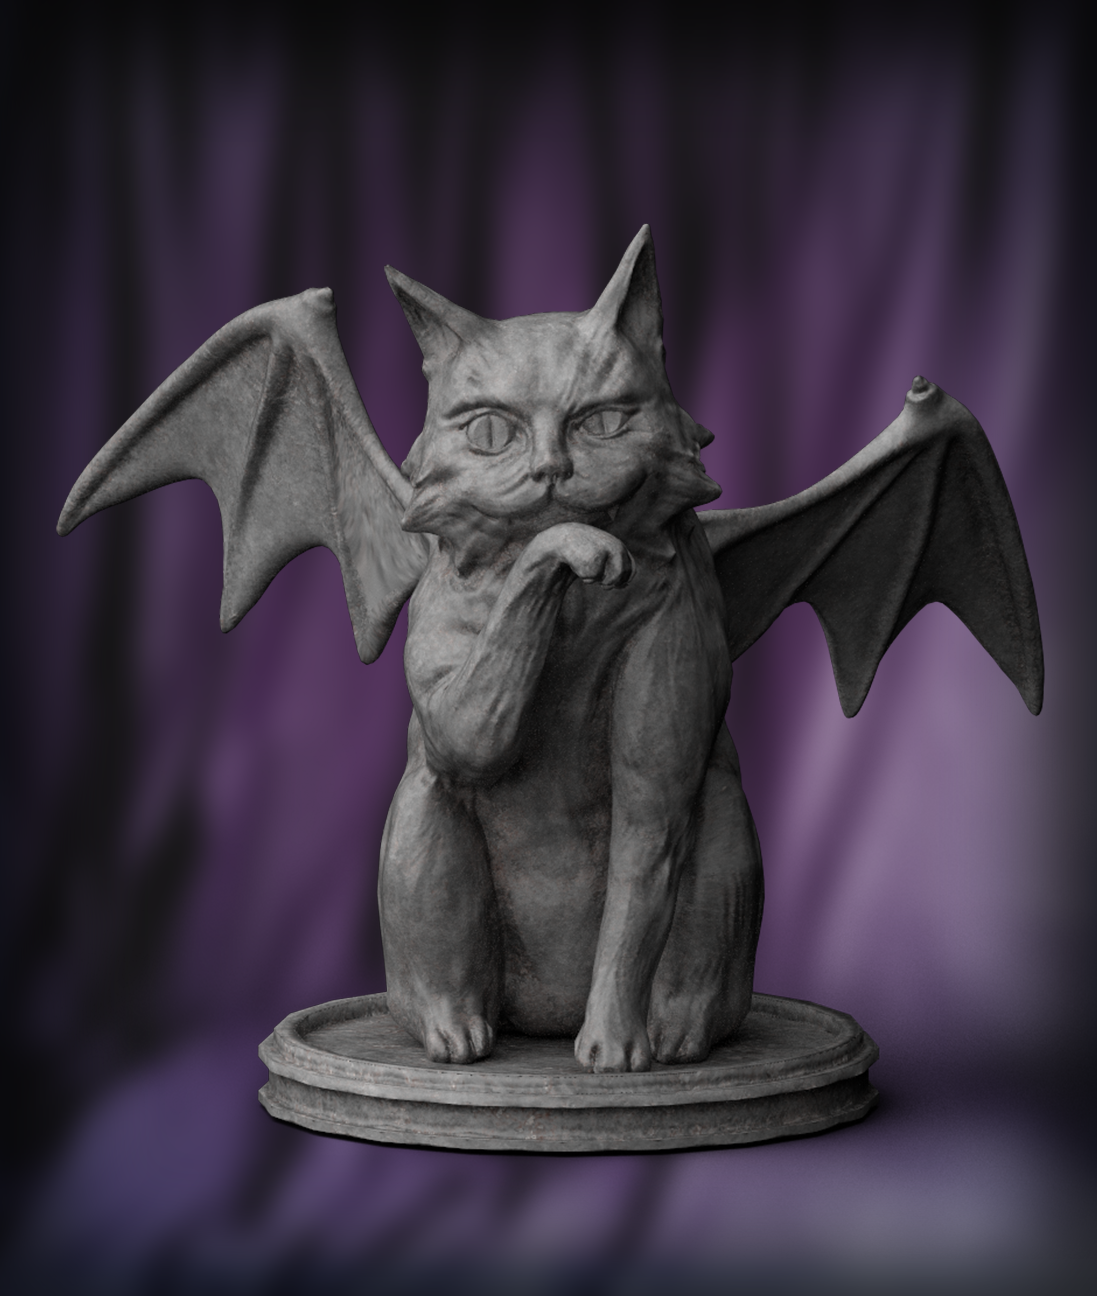 Cat Gargoyle with texture